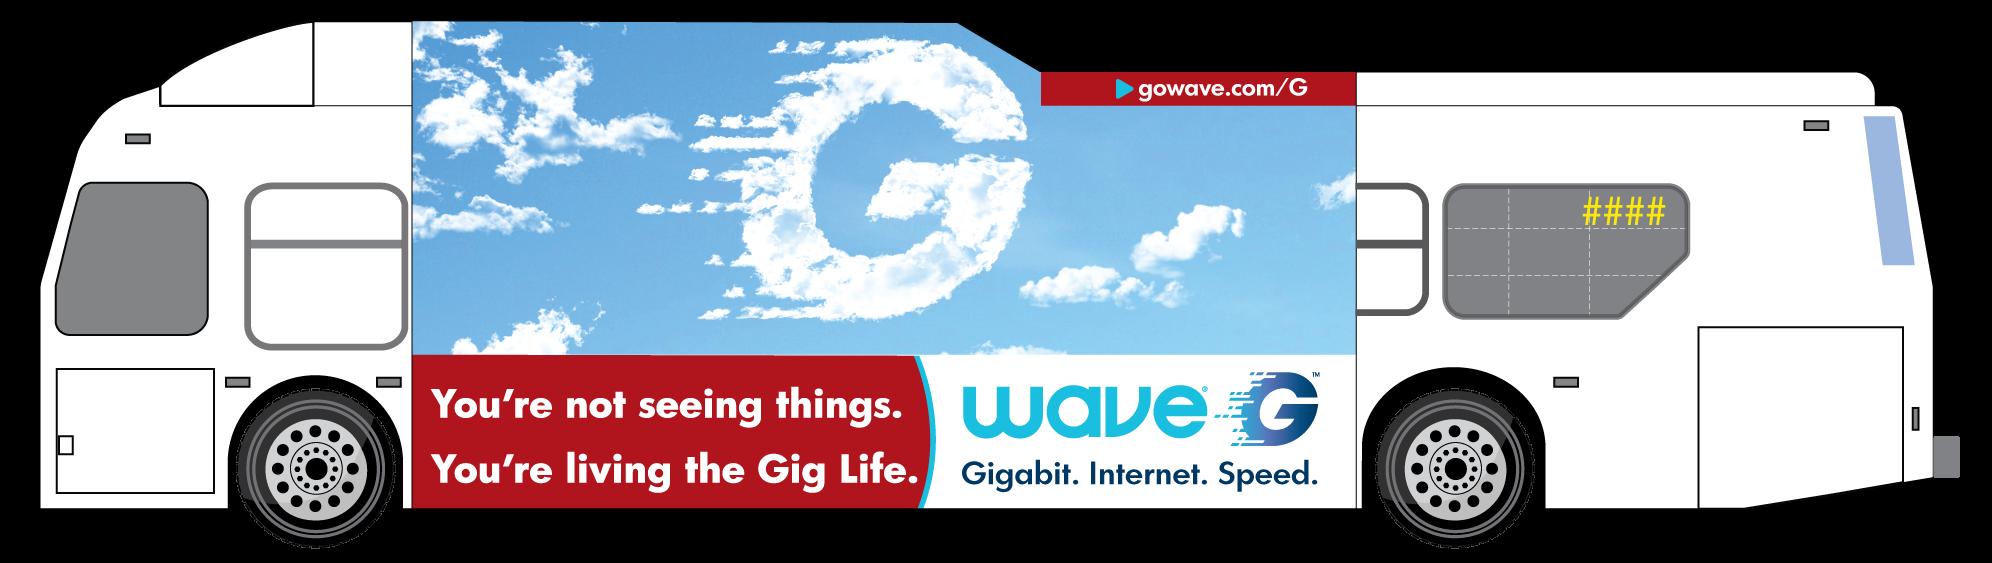 16_04_BUSWRAP-Gig-Life-Clouds.png